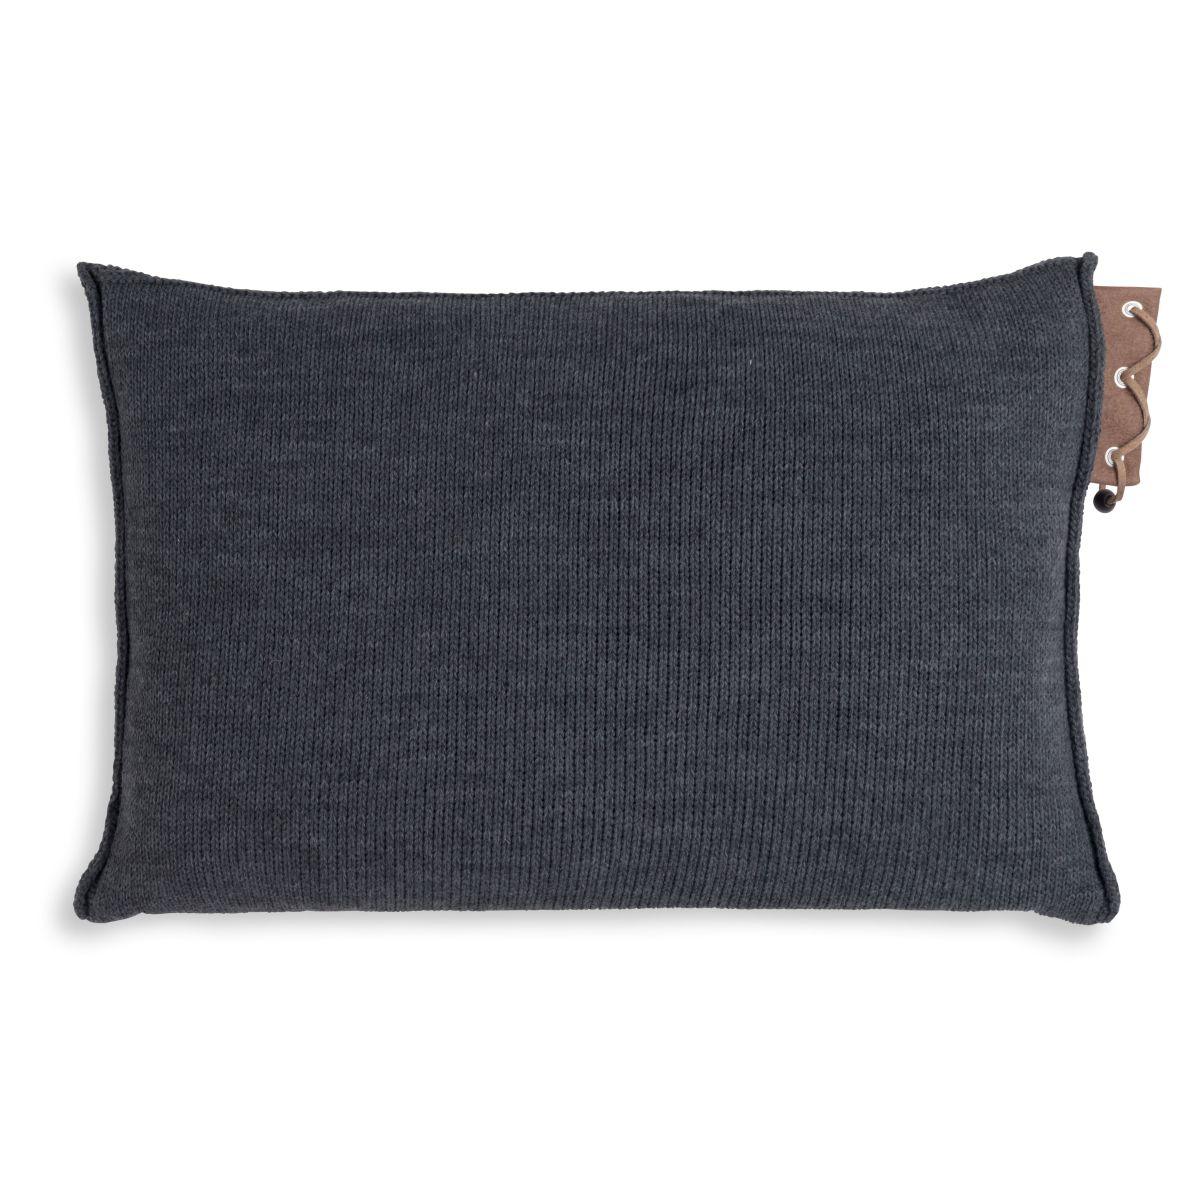 jay cushion anthracite 60x40